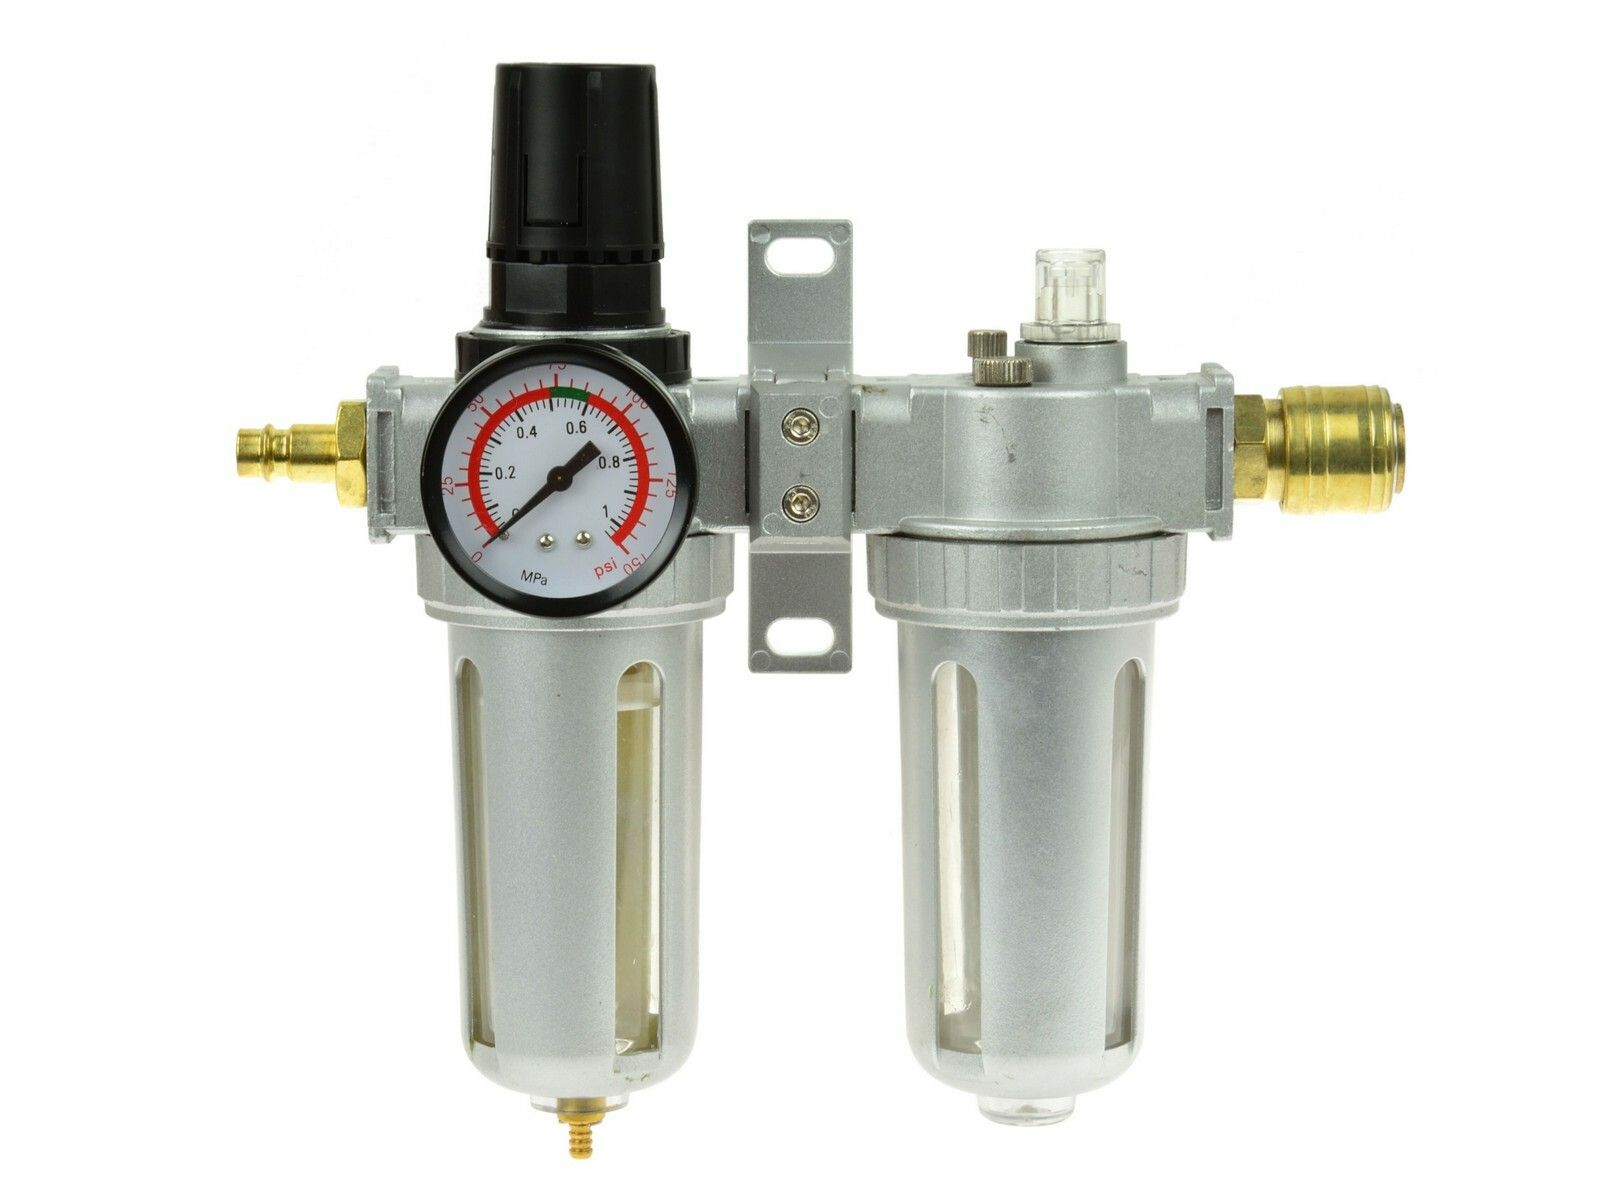 Regulátor tlaku s filtrem a manometrem a přim. oleje, max. prac. tlak 1,0MPa